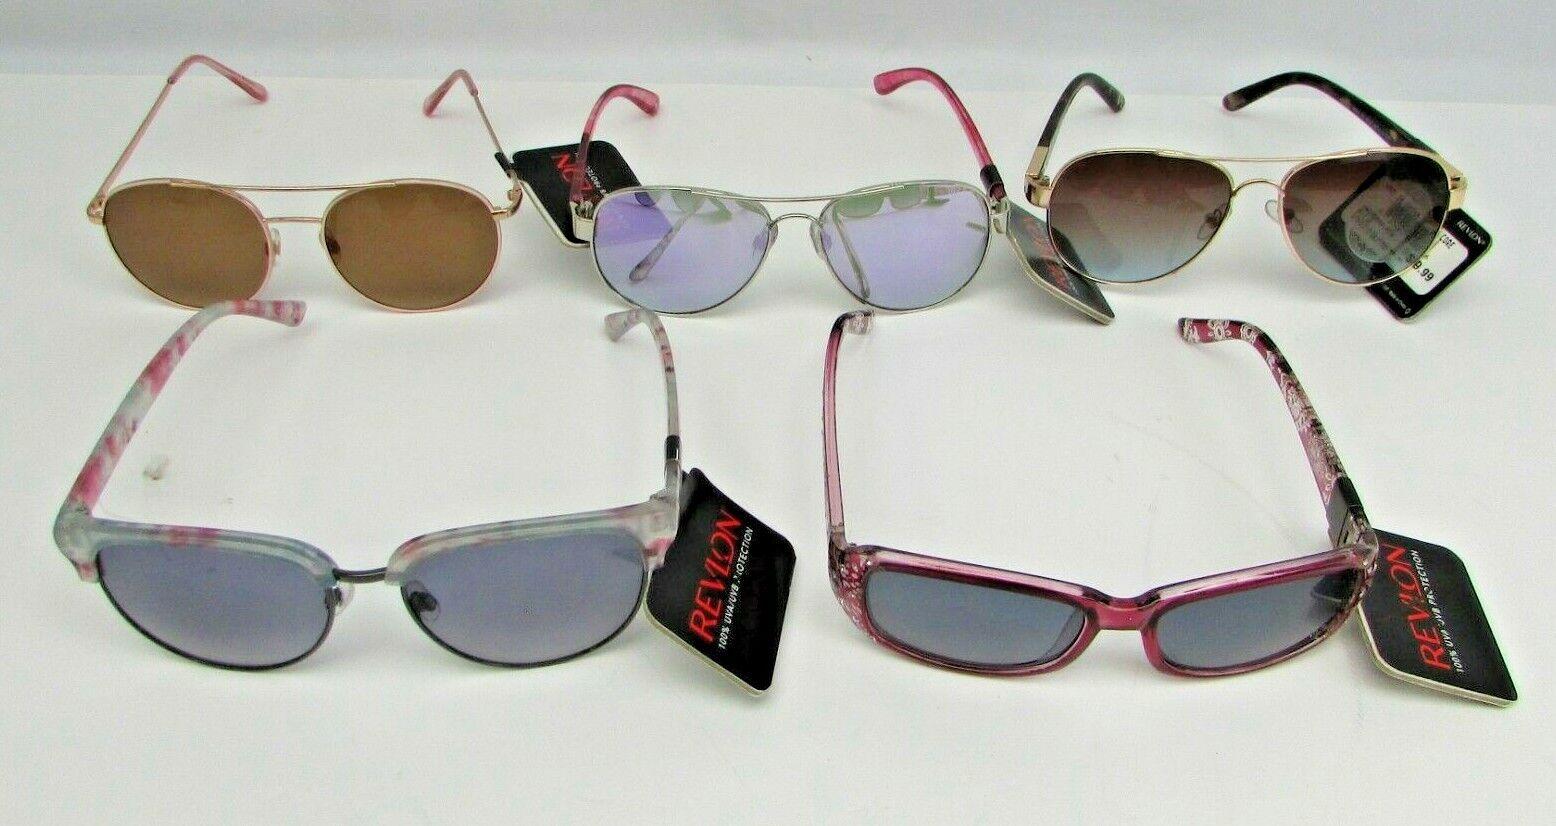 5 Revlon Women's Sunglasses, Assorted Lot #2, see description, NEW